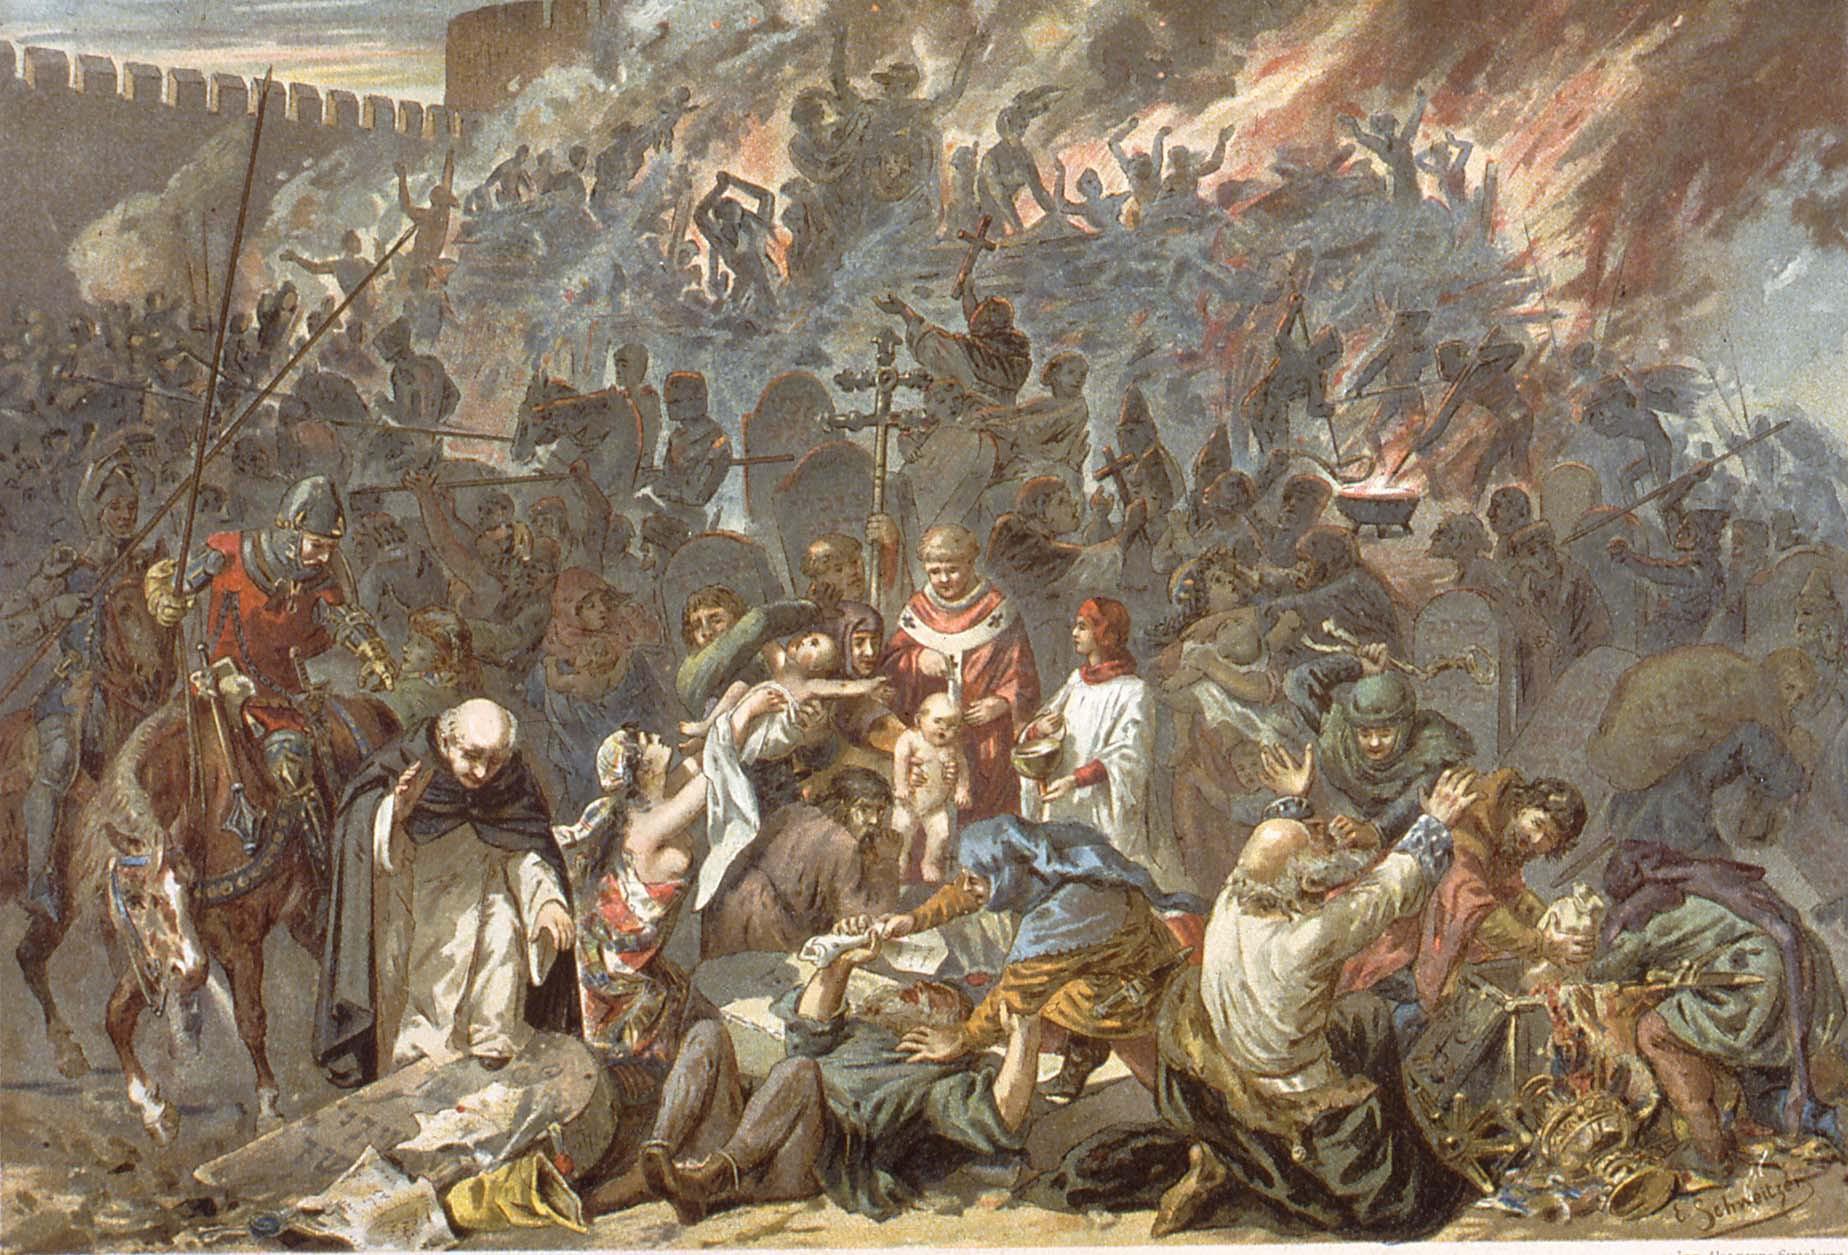 Pogrom, killing of Jews